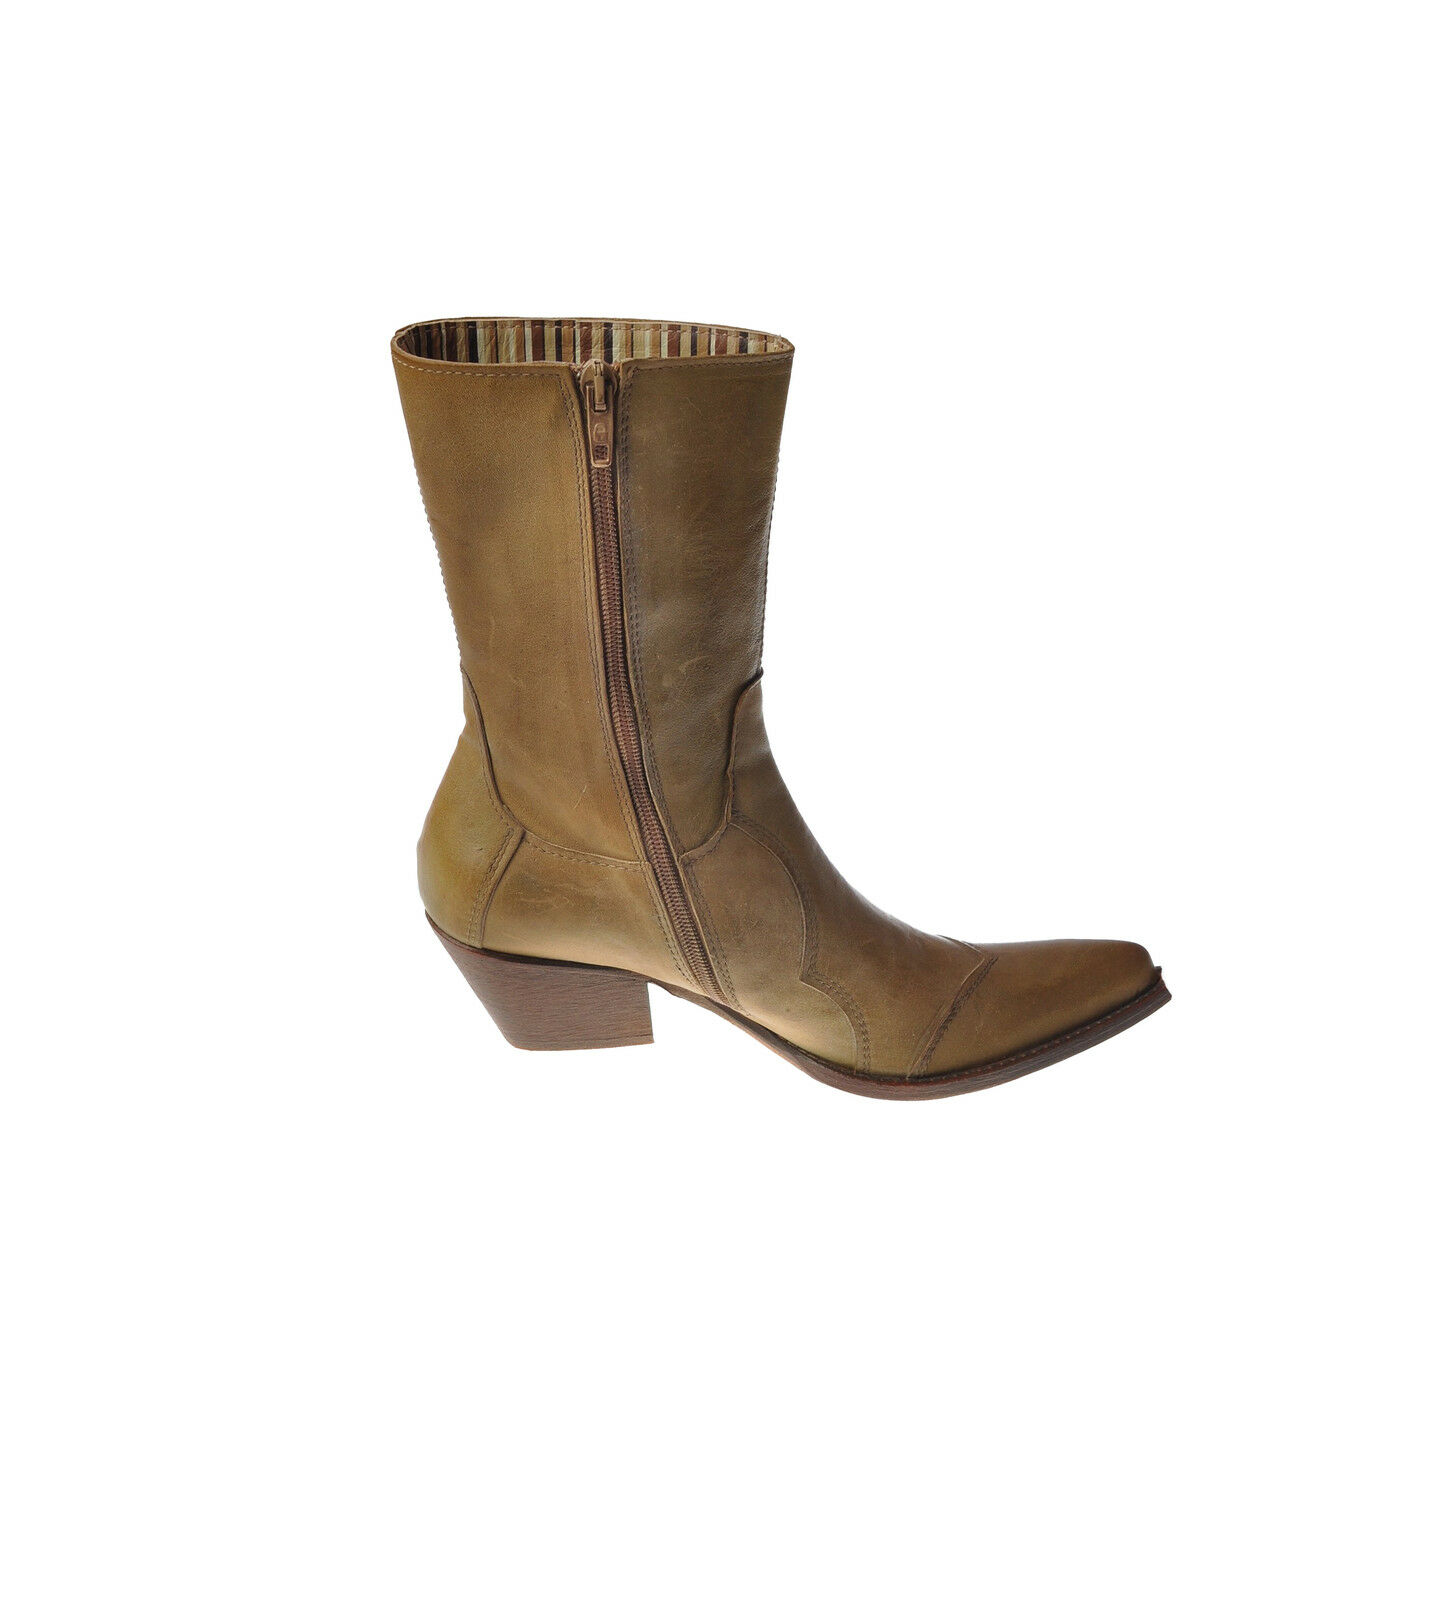 Moma - chaussures-bottes - - - Woman - vert - 3252328N185122 85de5f